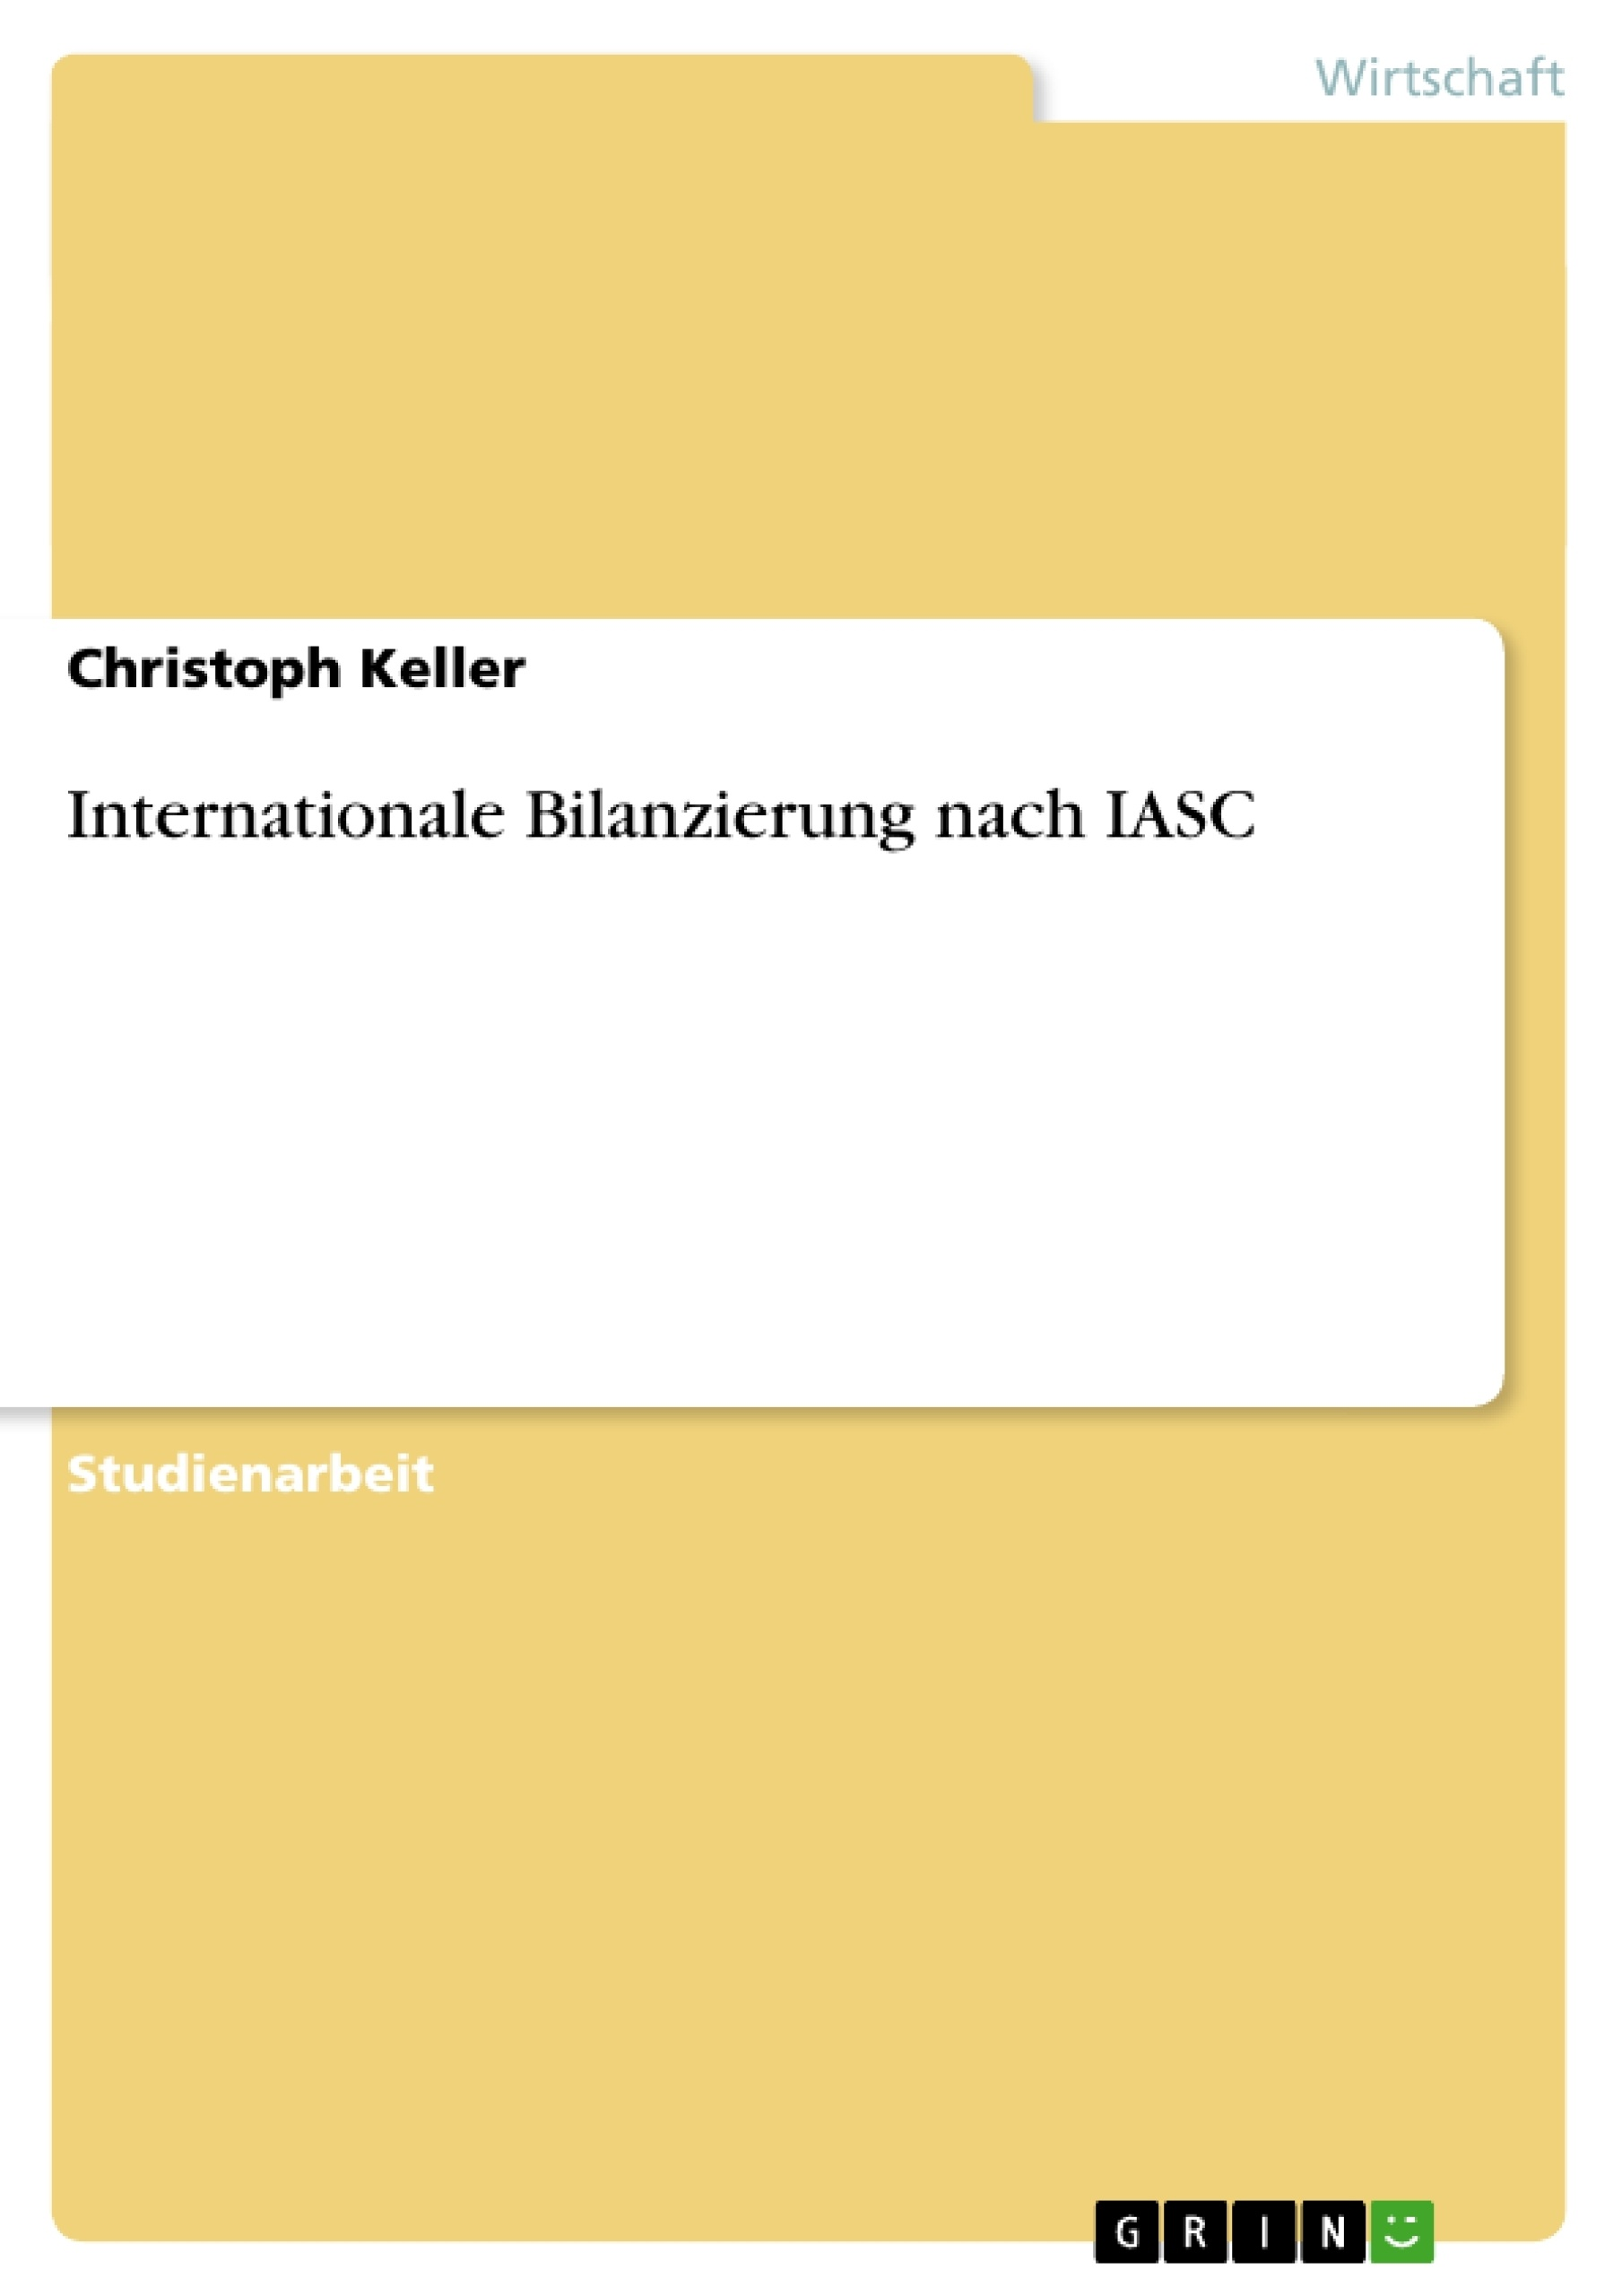 Titel: Internationale Bilanzierung nach IASC